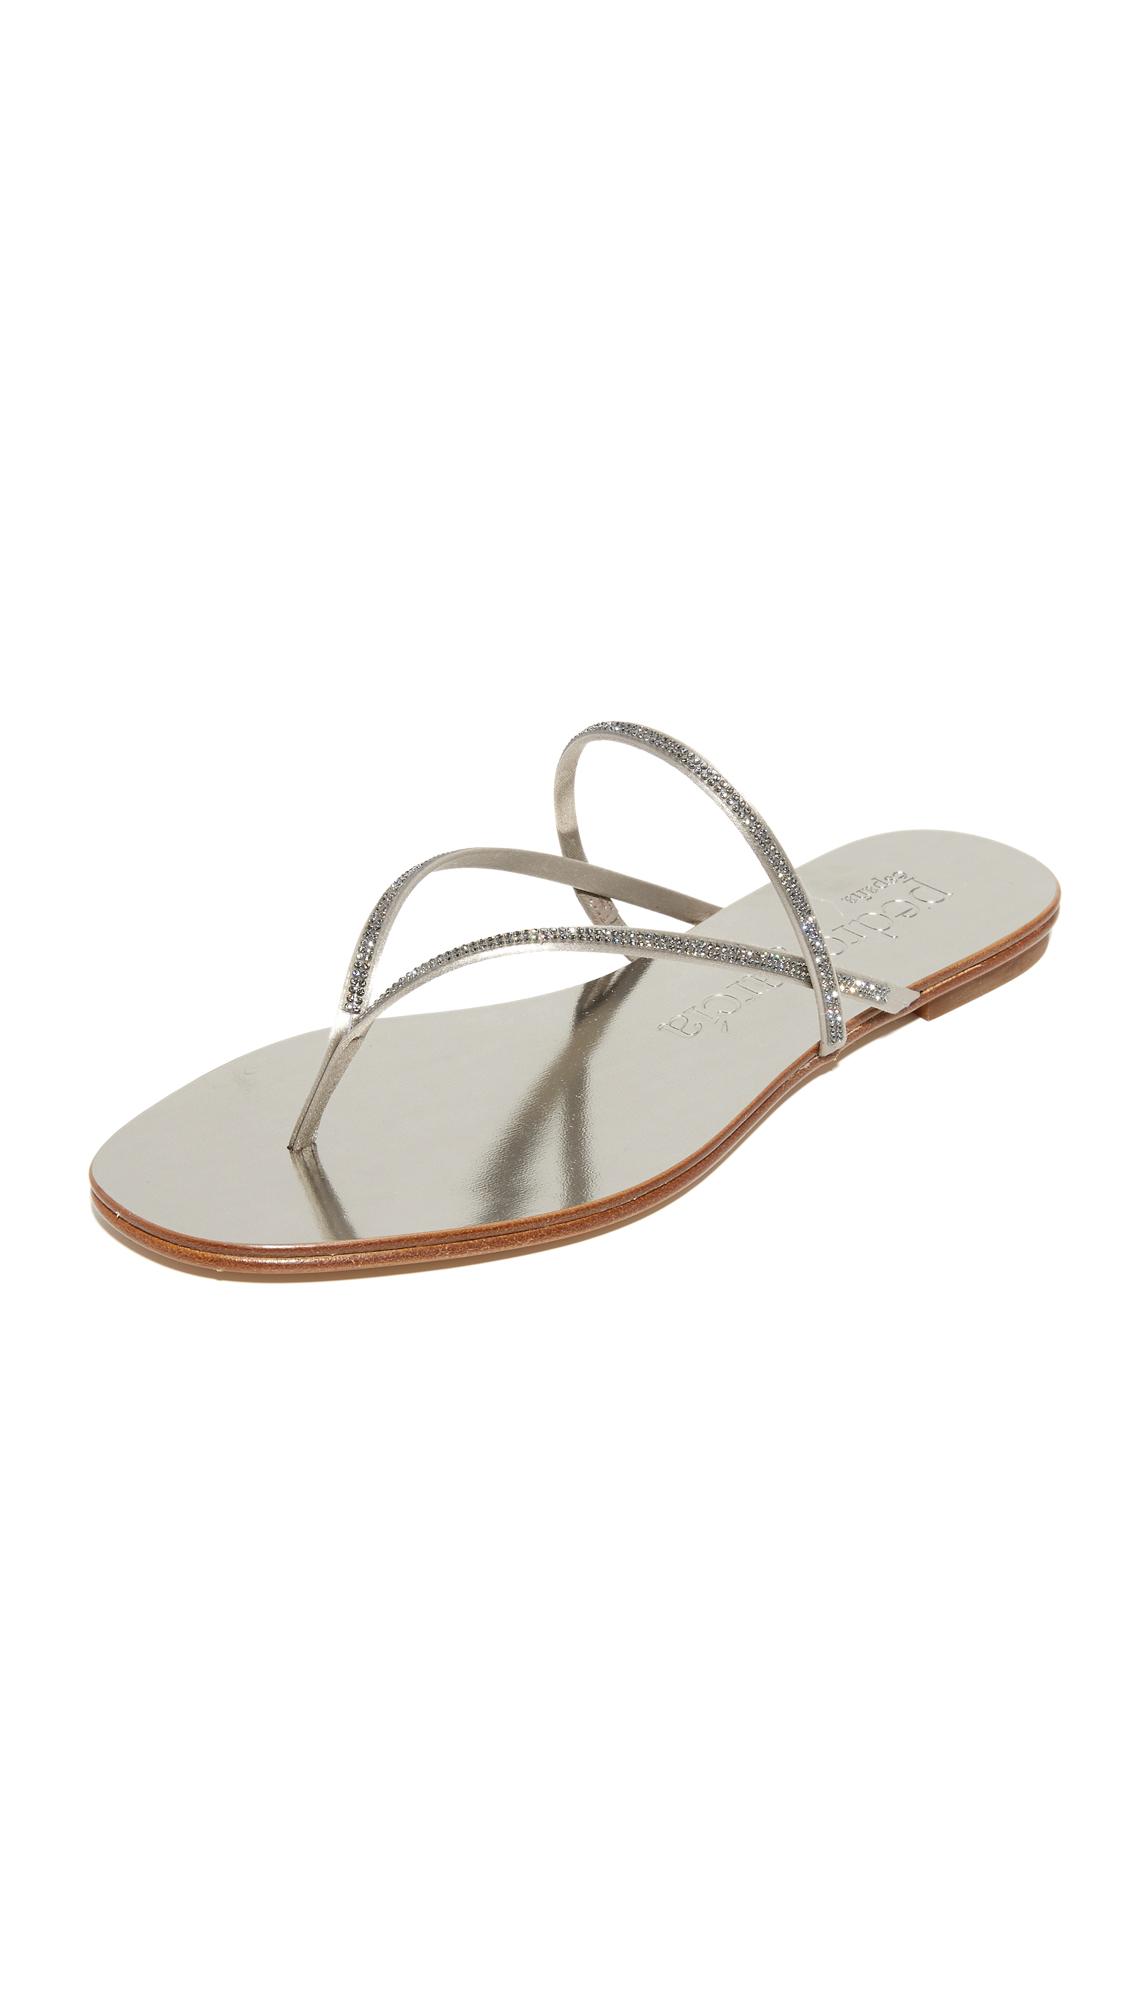 Pedro Garcia Enara Crystal Thong Sandals - Titanium